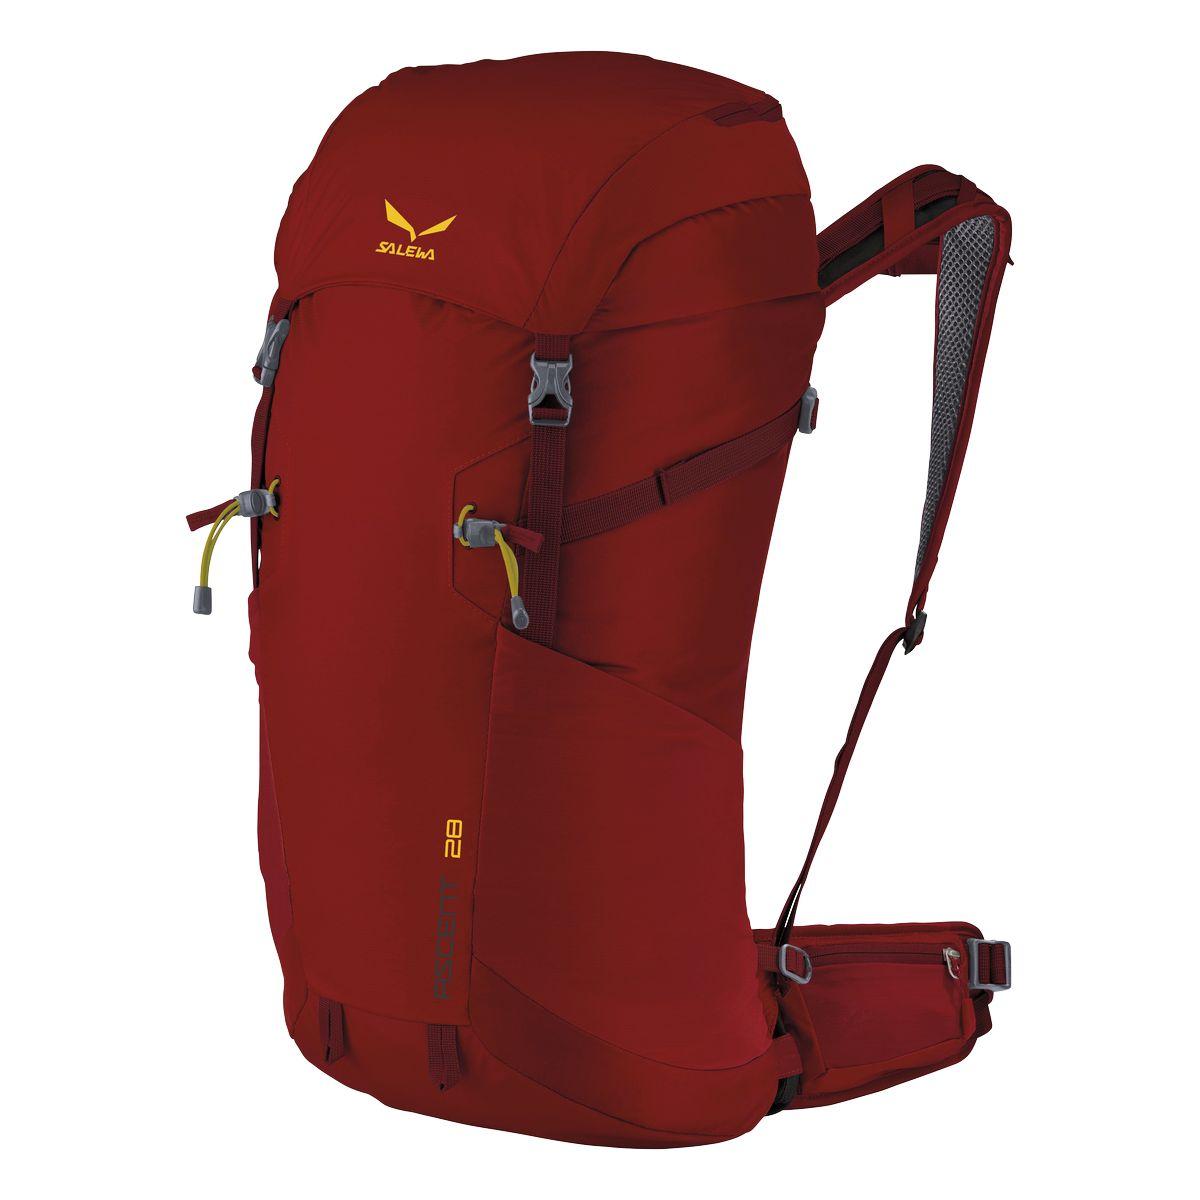 Рюкзак туристический Salewa 2016 Ascent 28 Pompei Red - артикул: 818370164